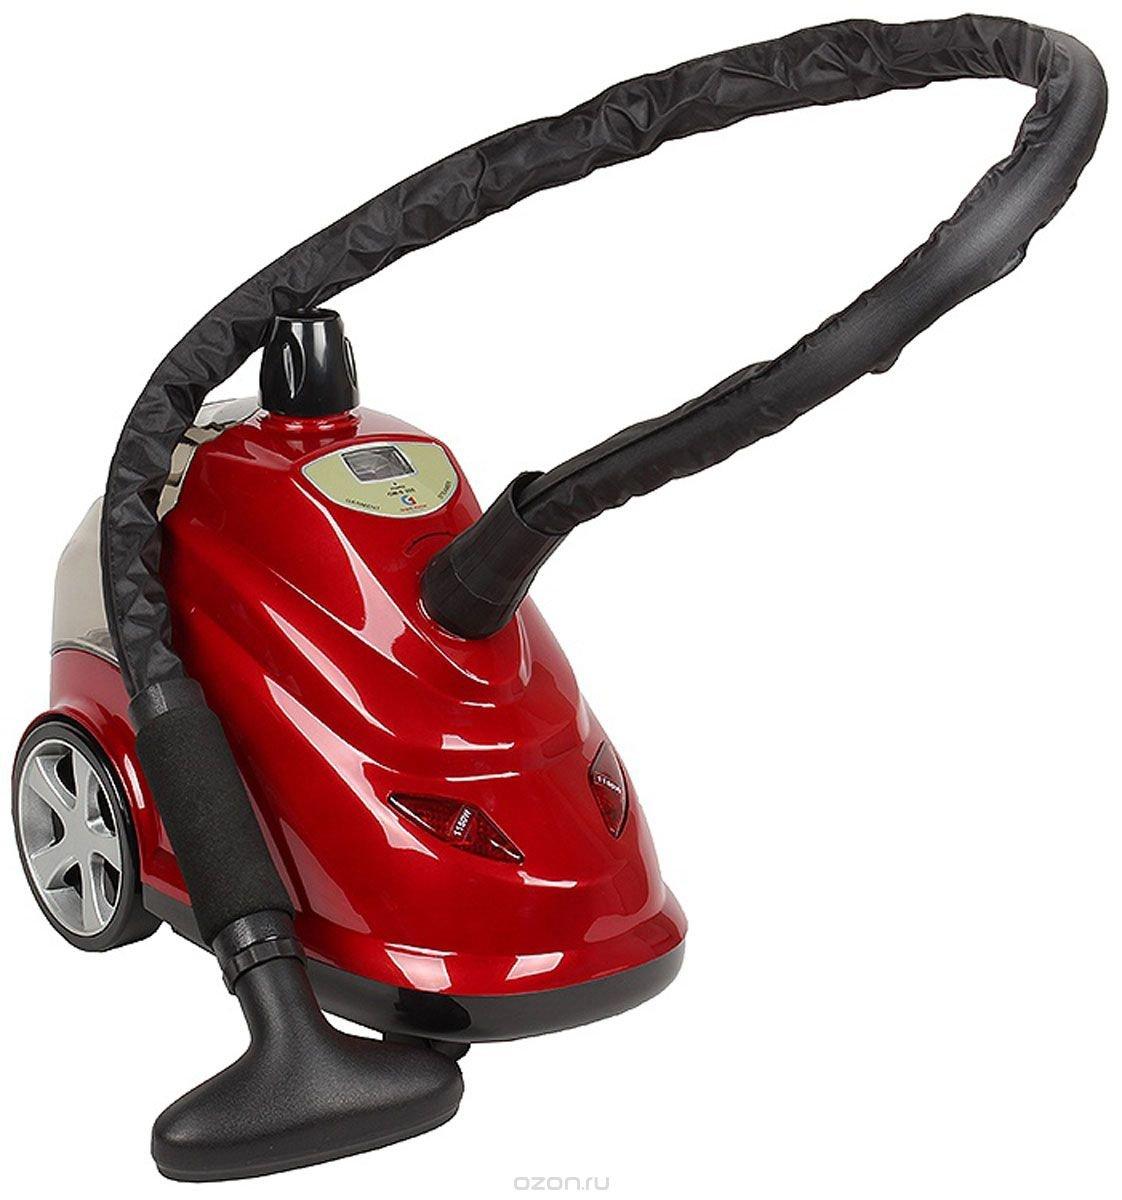 Grand Master GM-S205 Professional, Red отпариватель